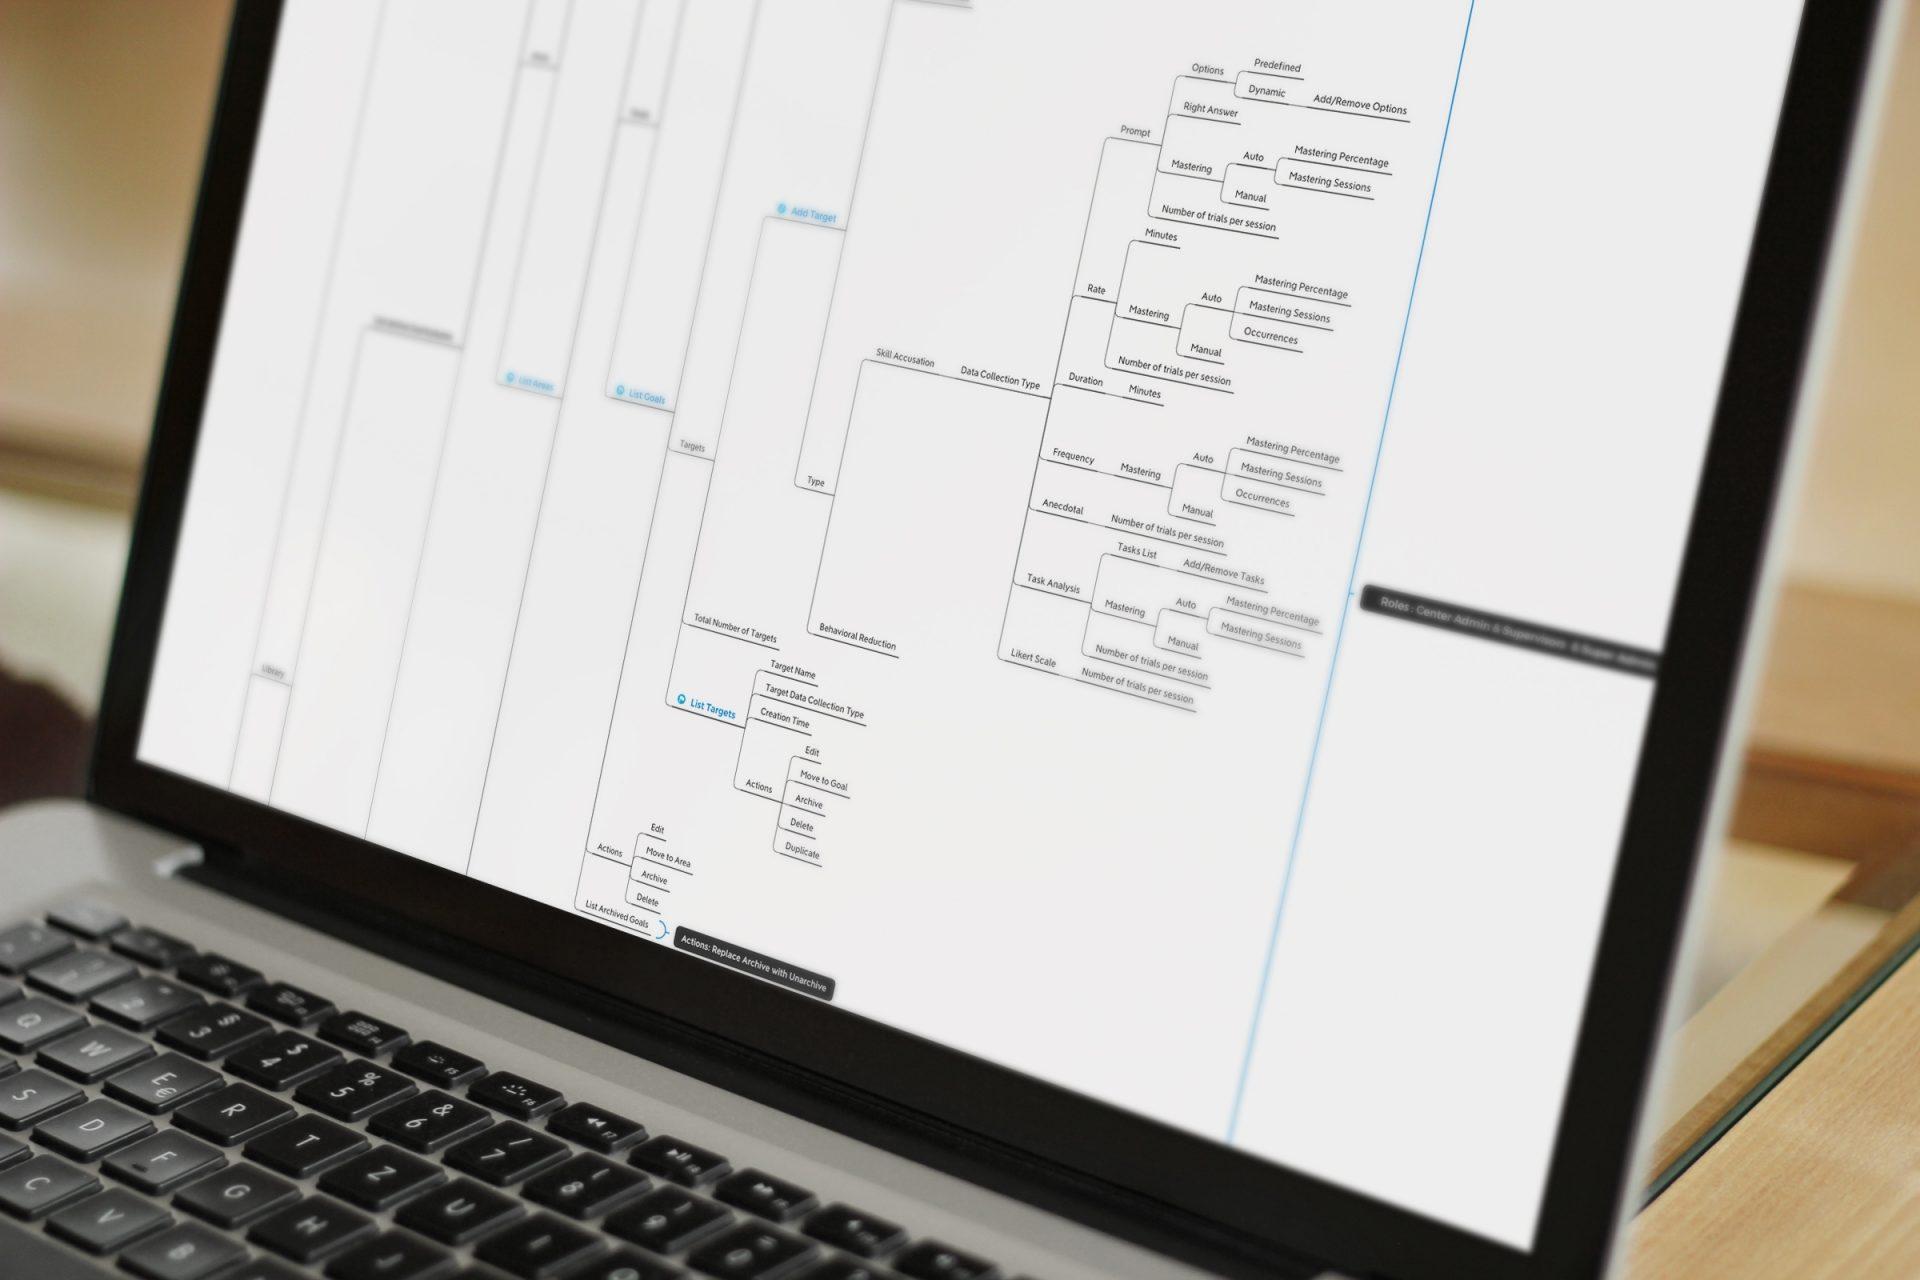 Ynmo - Special Education Management Platform - Information Architecture